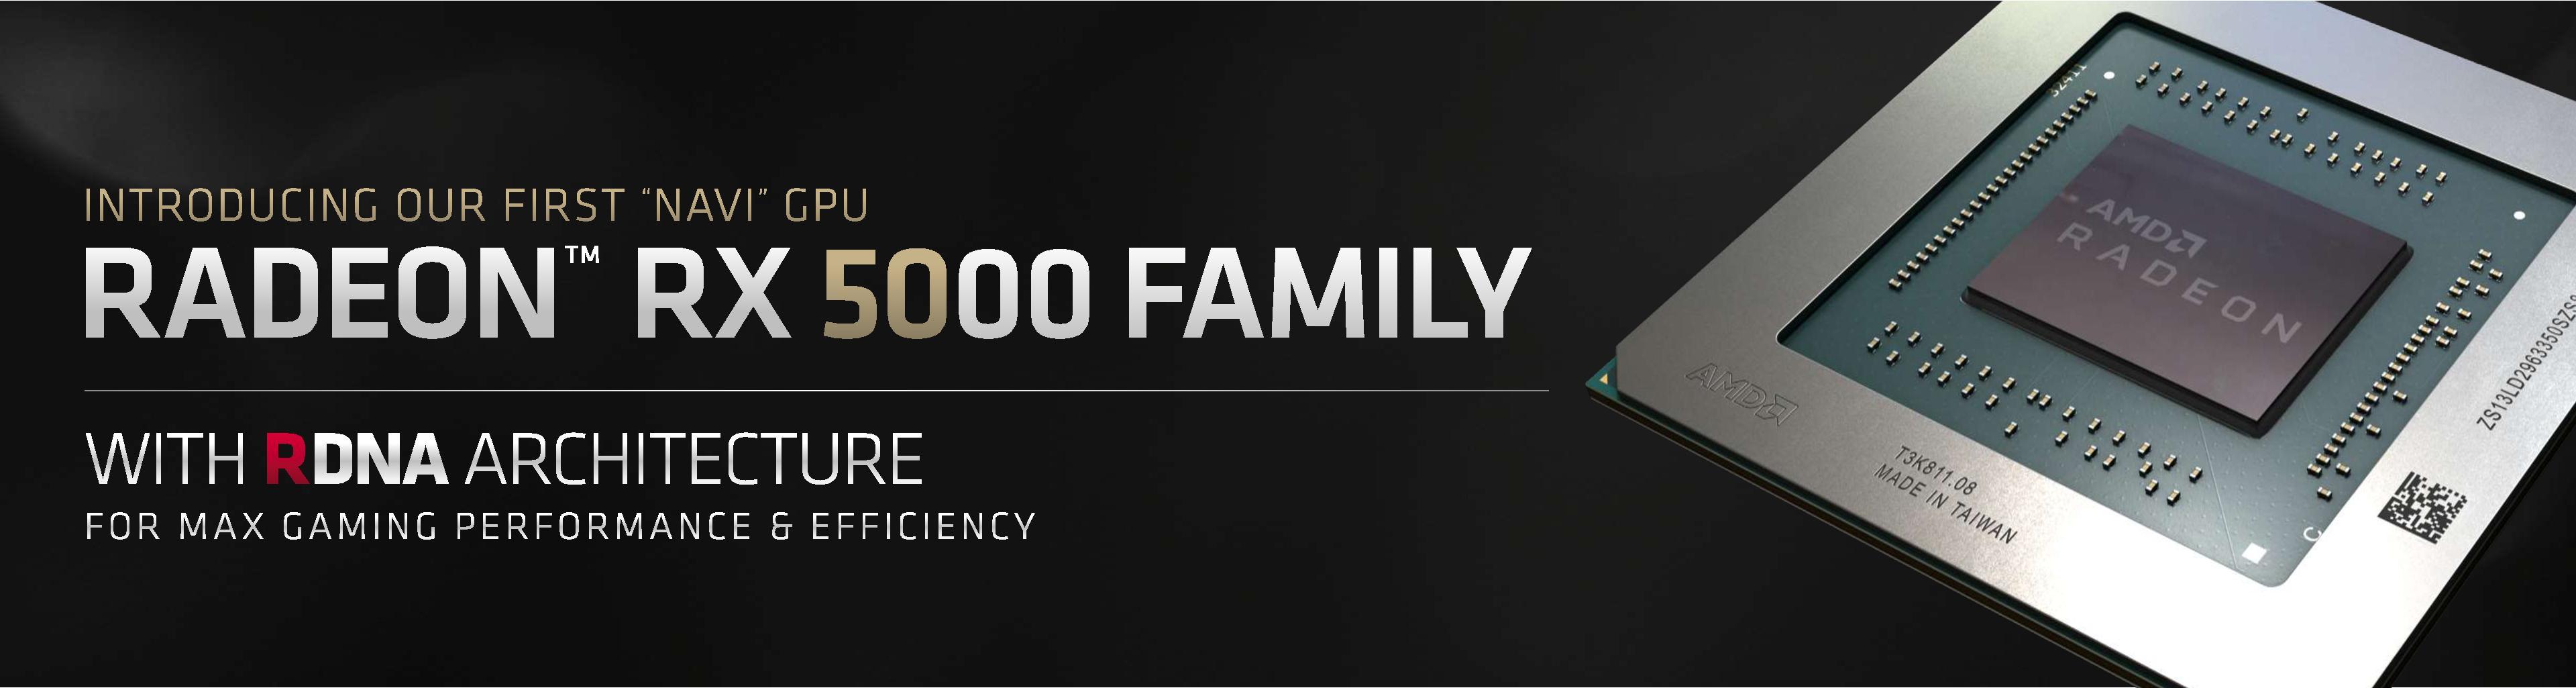 rx_5000_fam